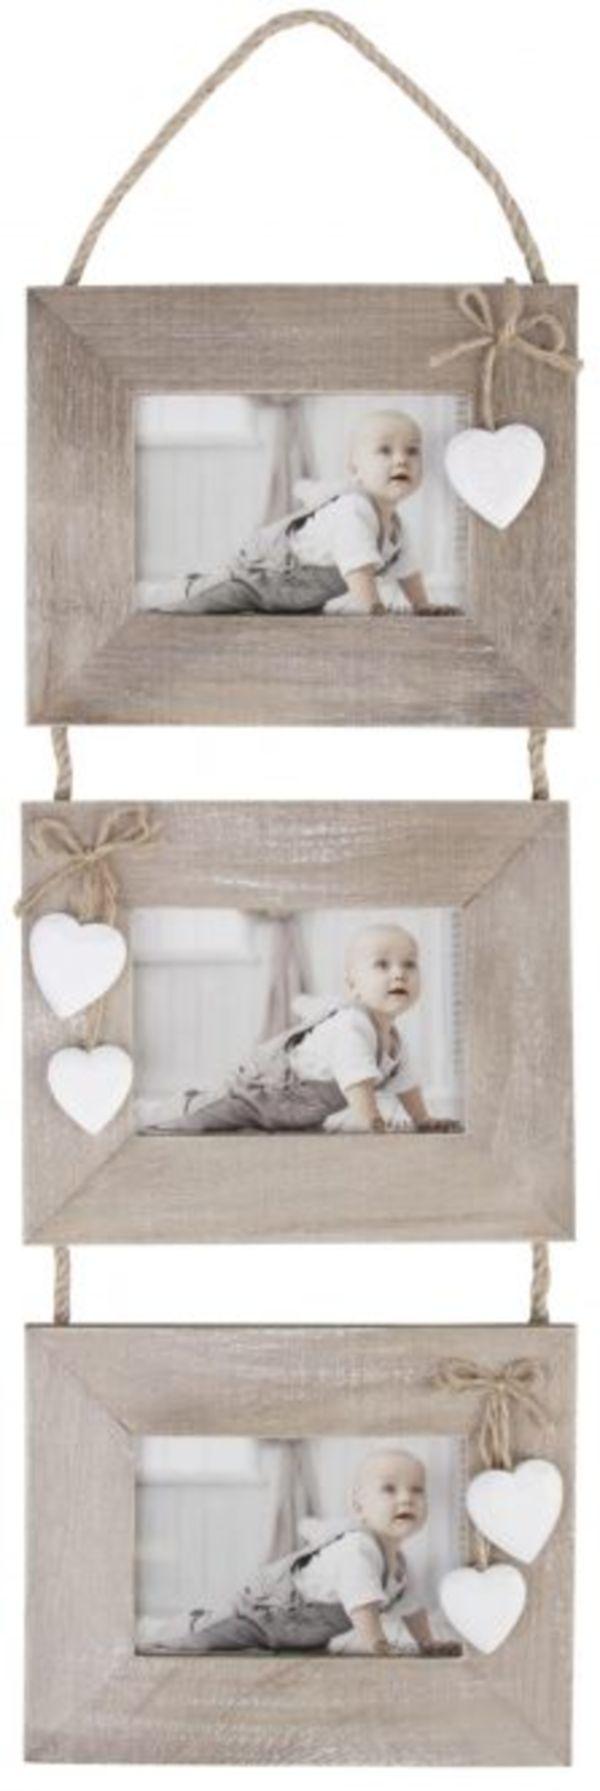 Hänge-Bilderrahmen für 3 Fotos à 15 x 10 cm - aus Holz - 20 x 2,5 x ...